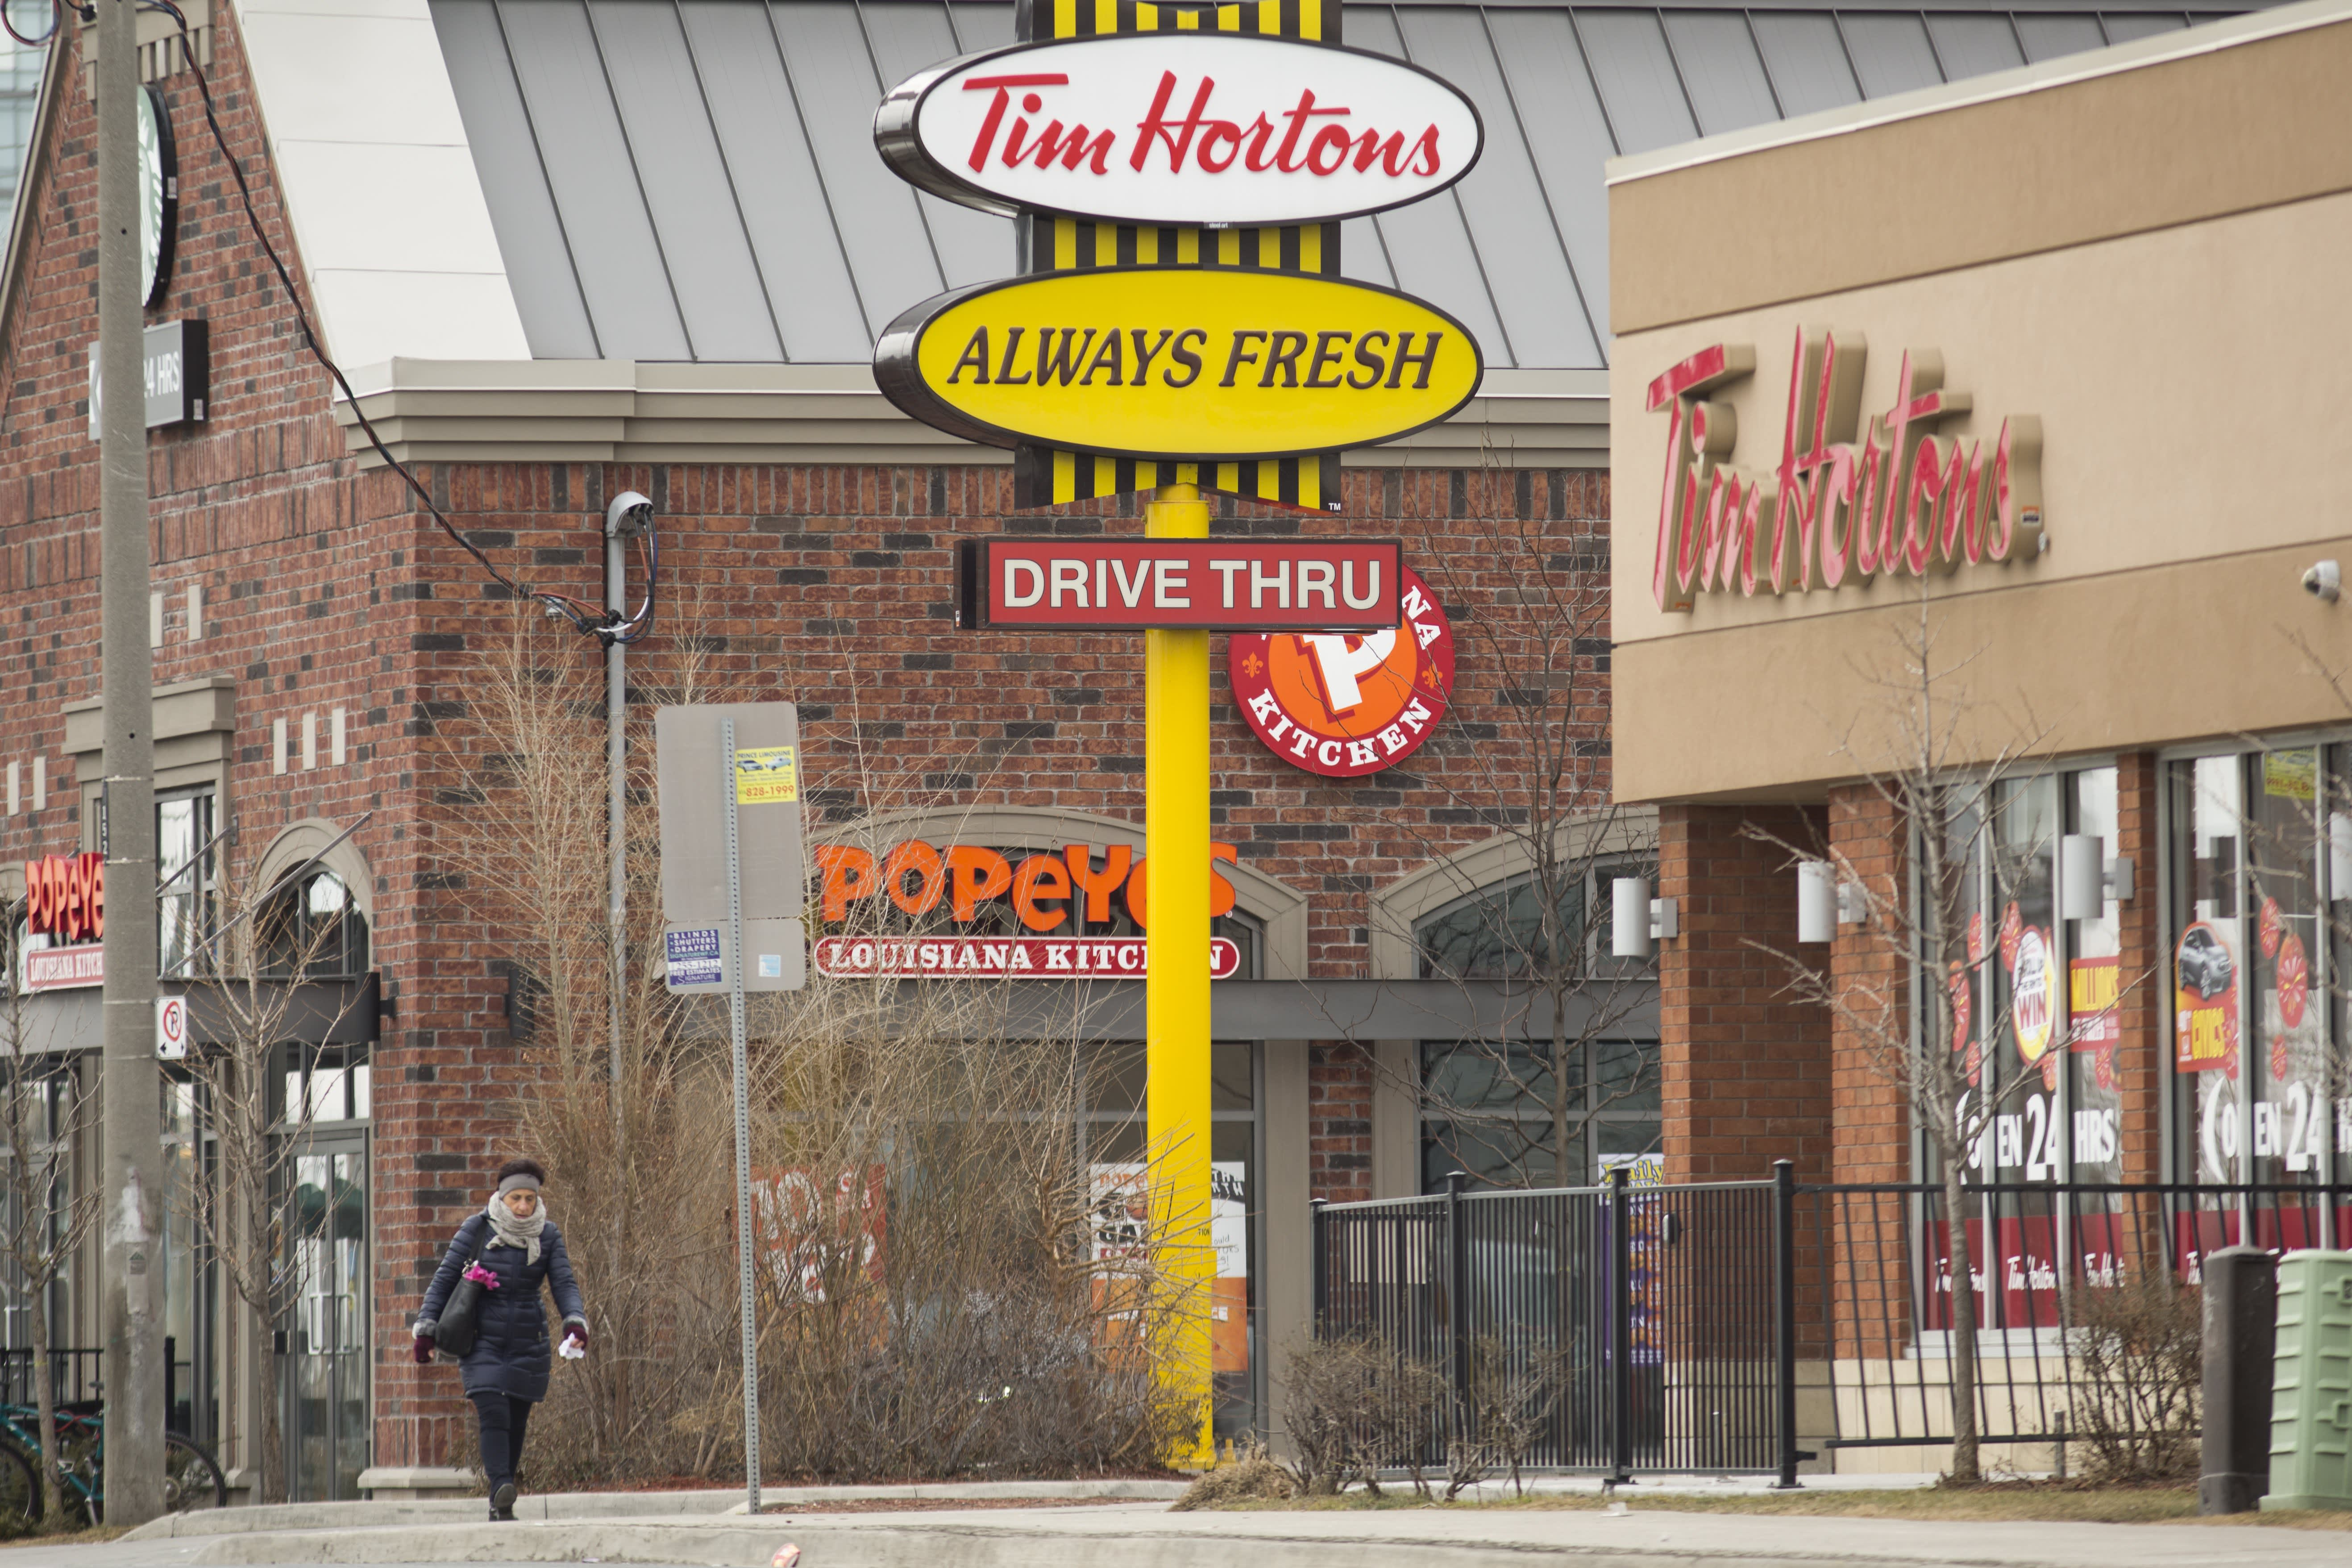 After weak third-quarter sales, Tim Hortons' parent rolls up its sleeves to fix struggling business